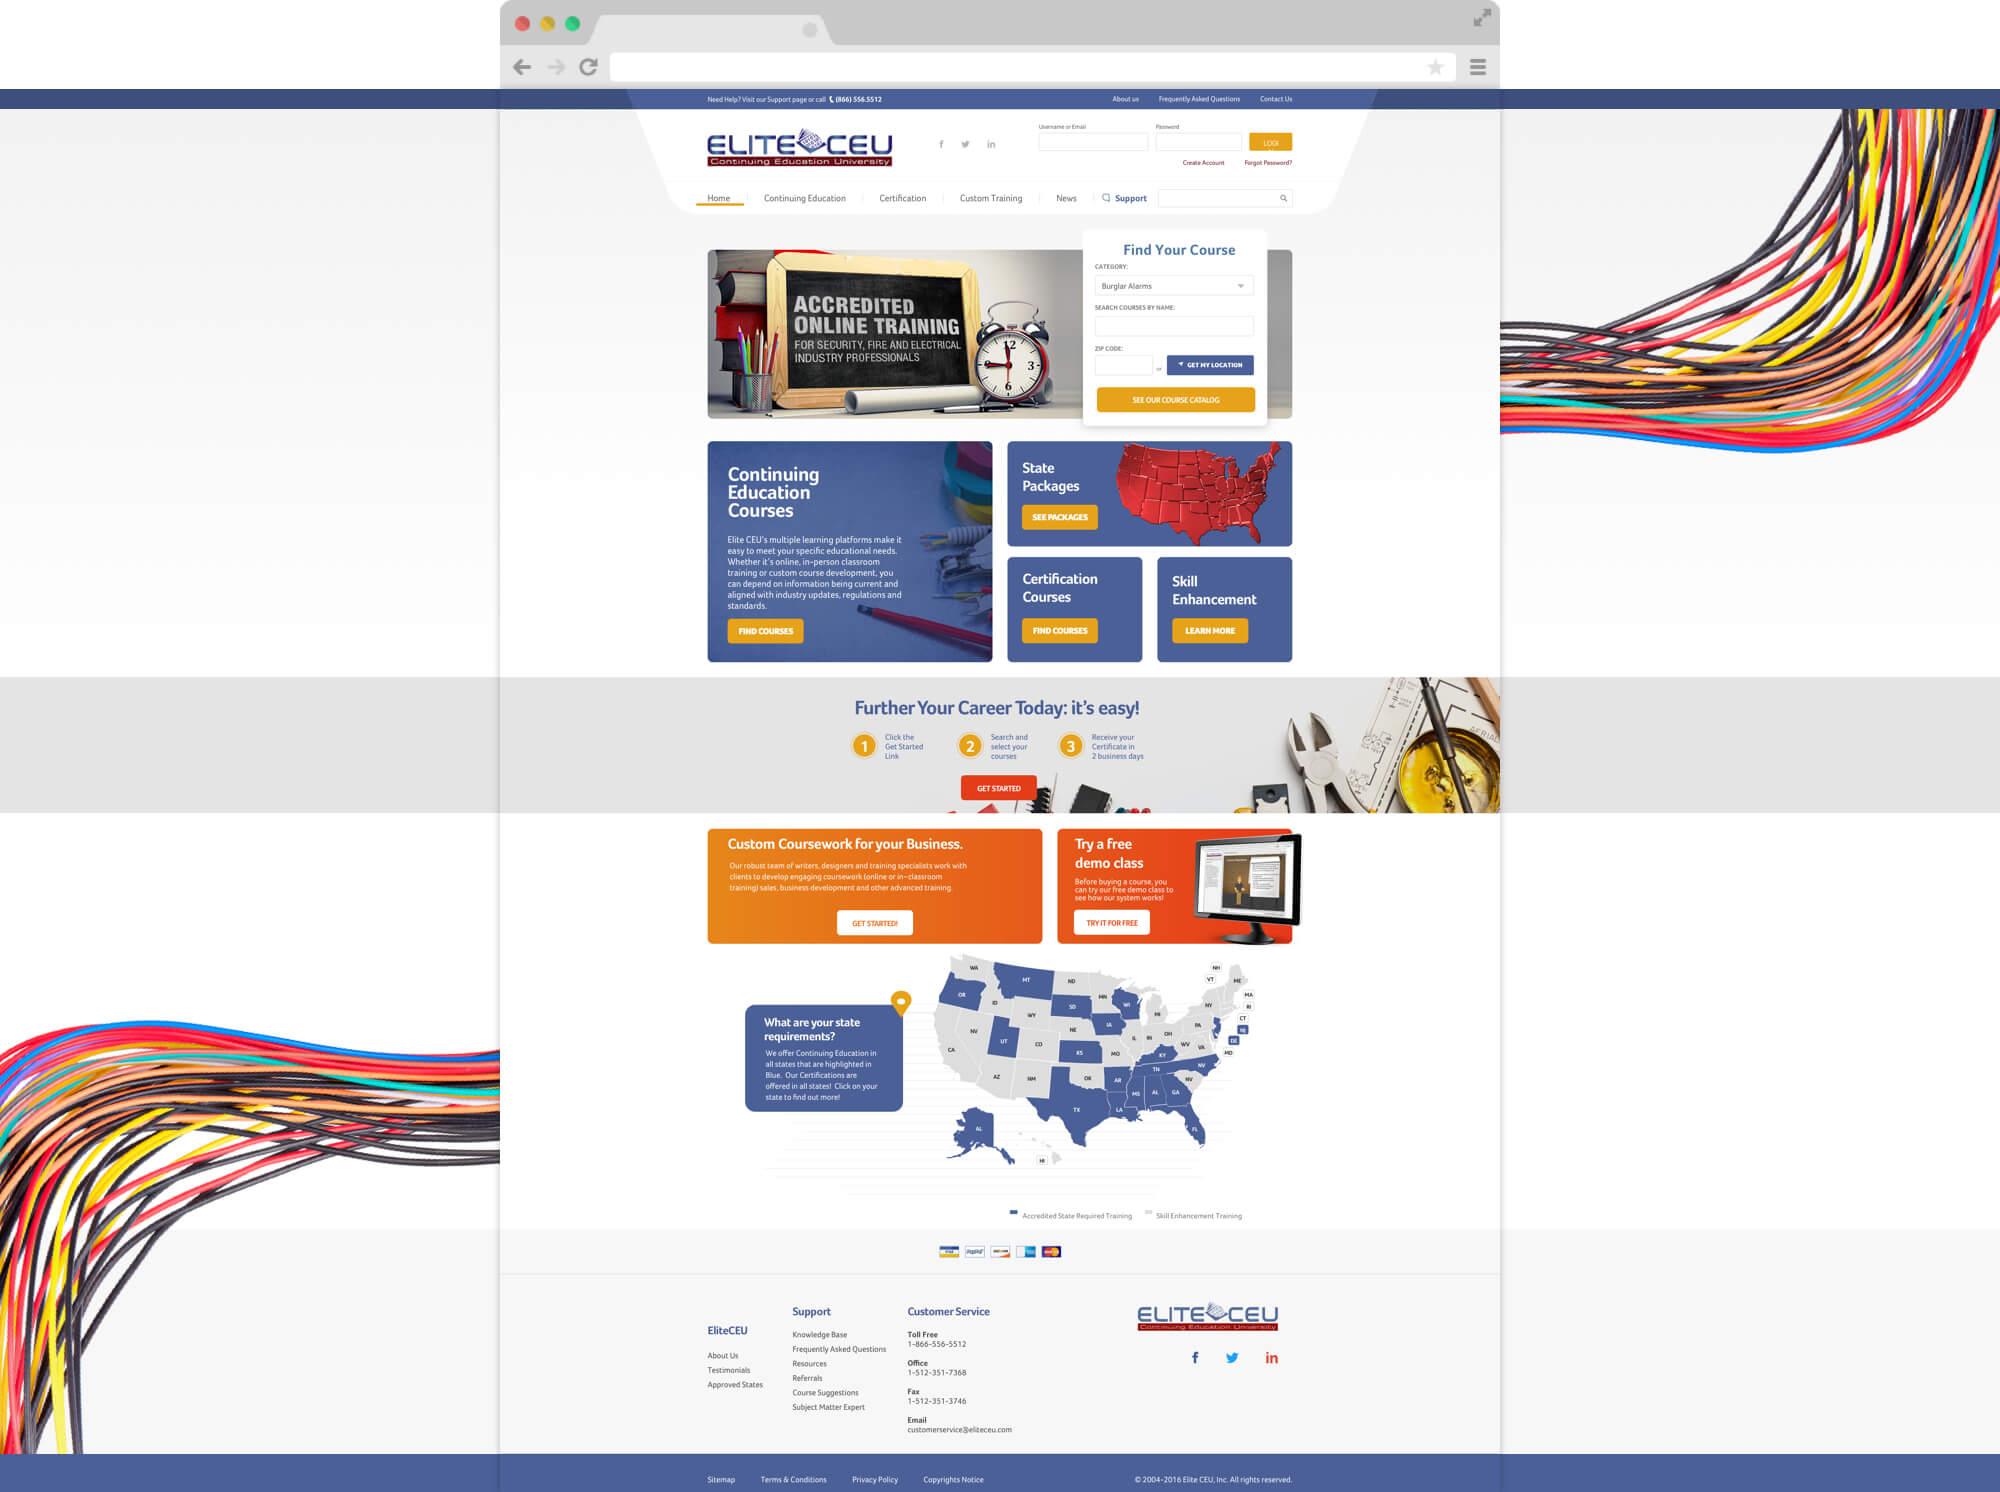 Tremendous Elite Ceu Fahrenheit Marketing Download Free Architecture Designs Intelgarnamadebymaigaardcom